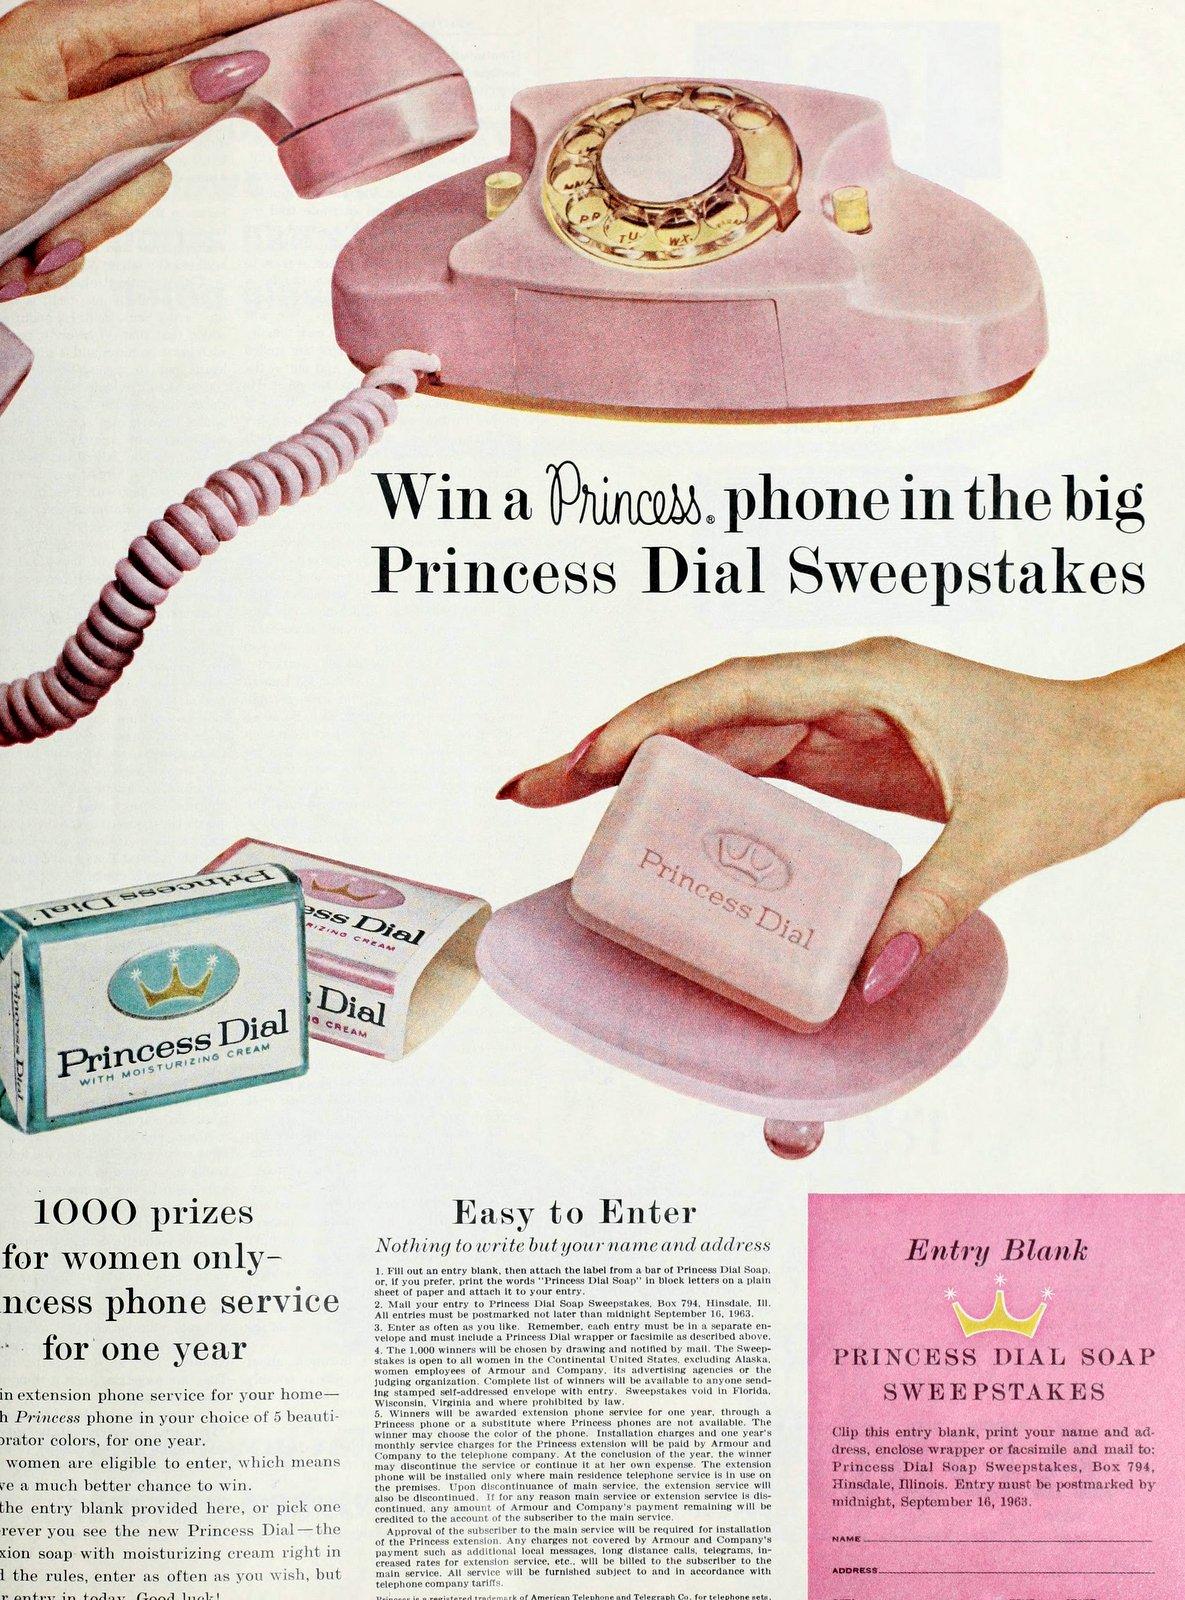 Princess Dial soap and Princess telephones (1963)